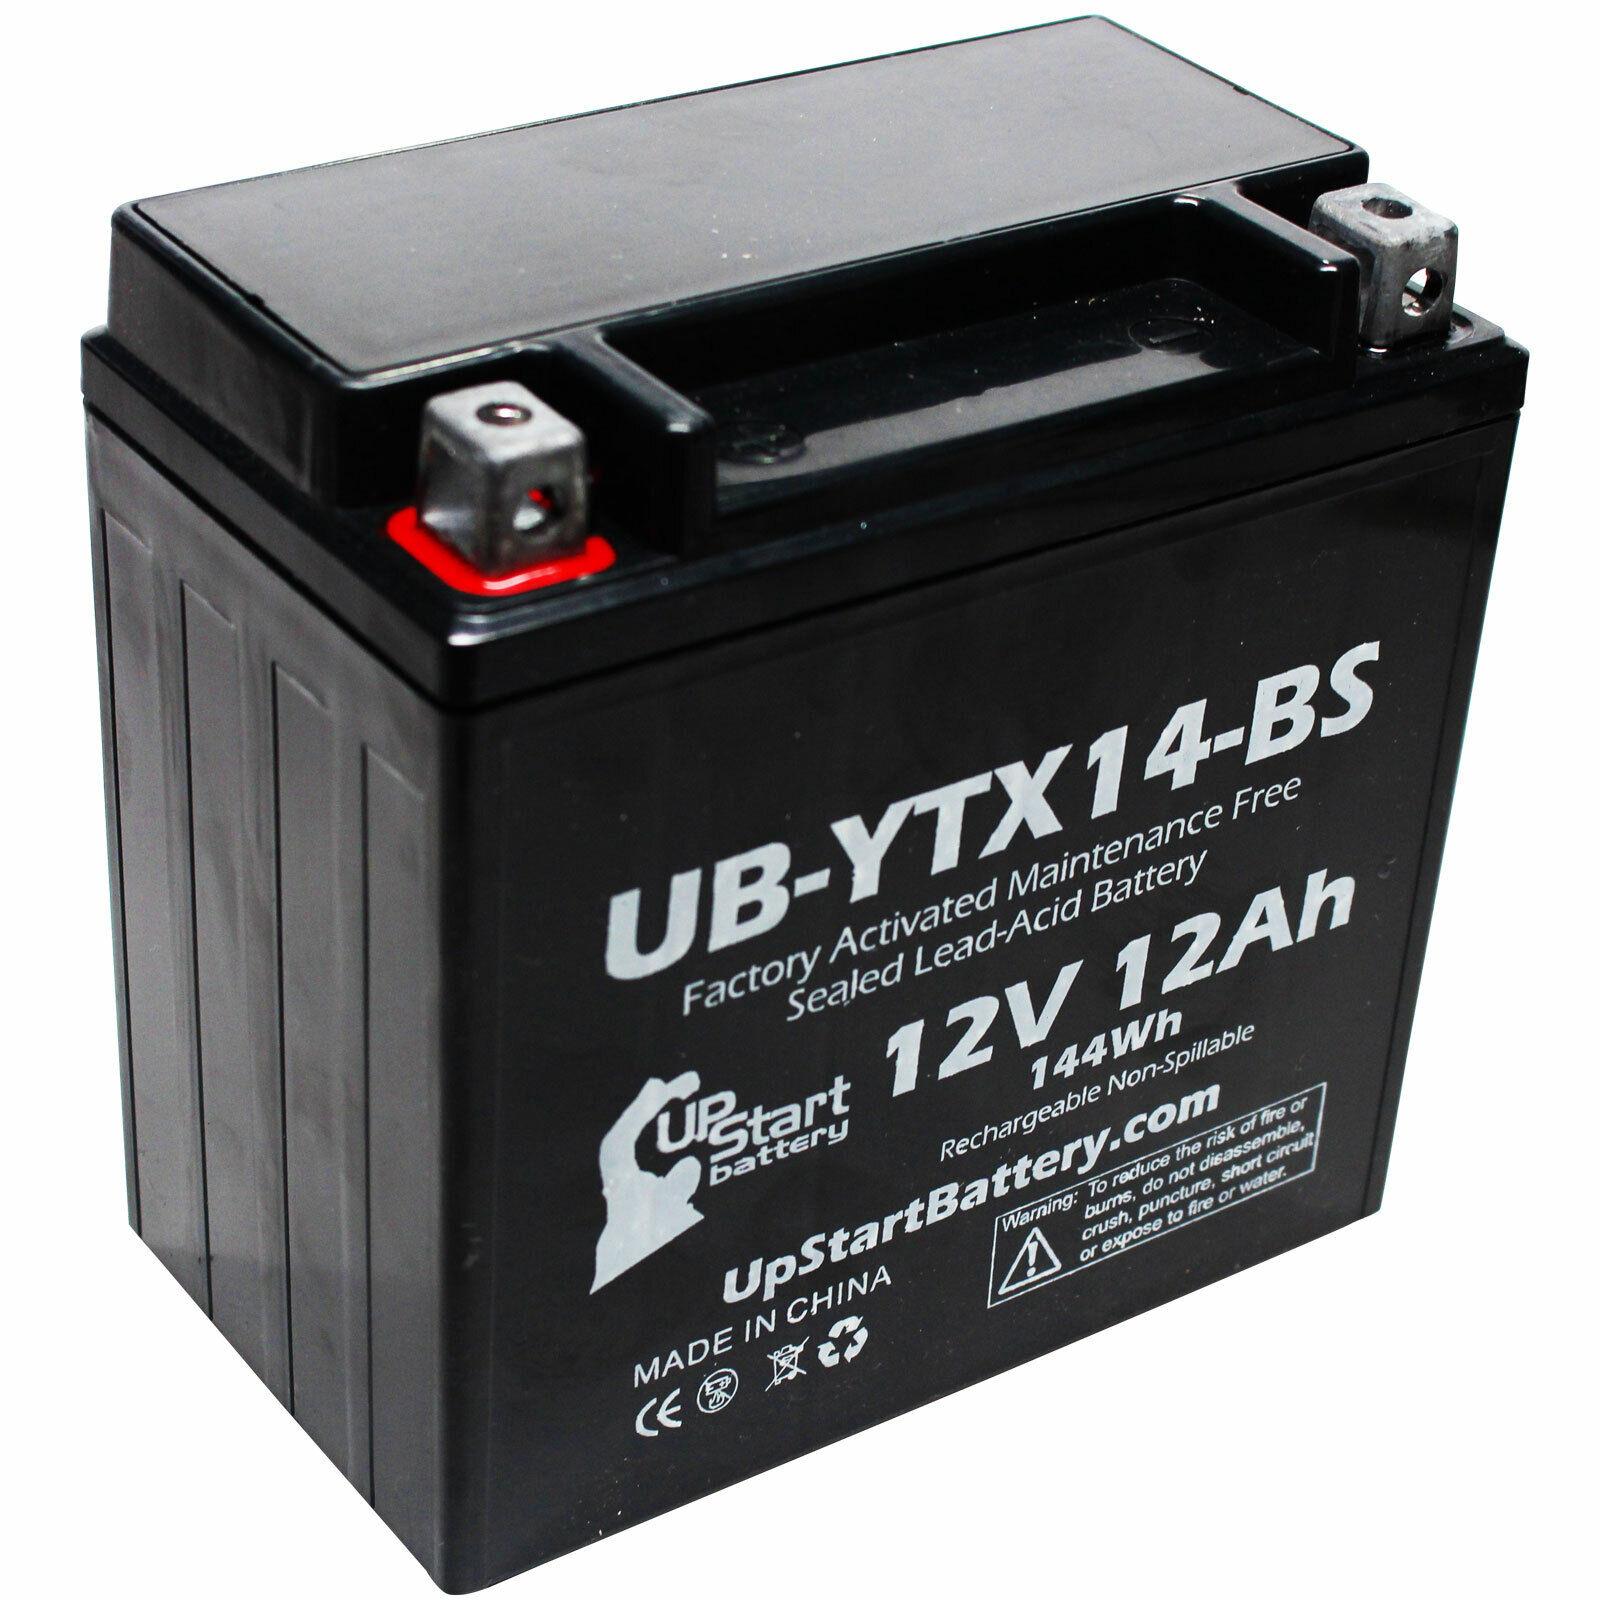 12V 12AH Battery for 2004 Honda TRX400 Rancher AT 400 CC